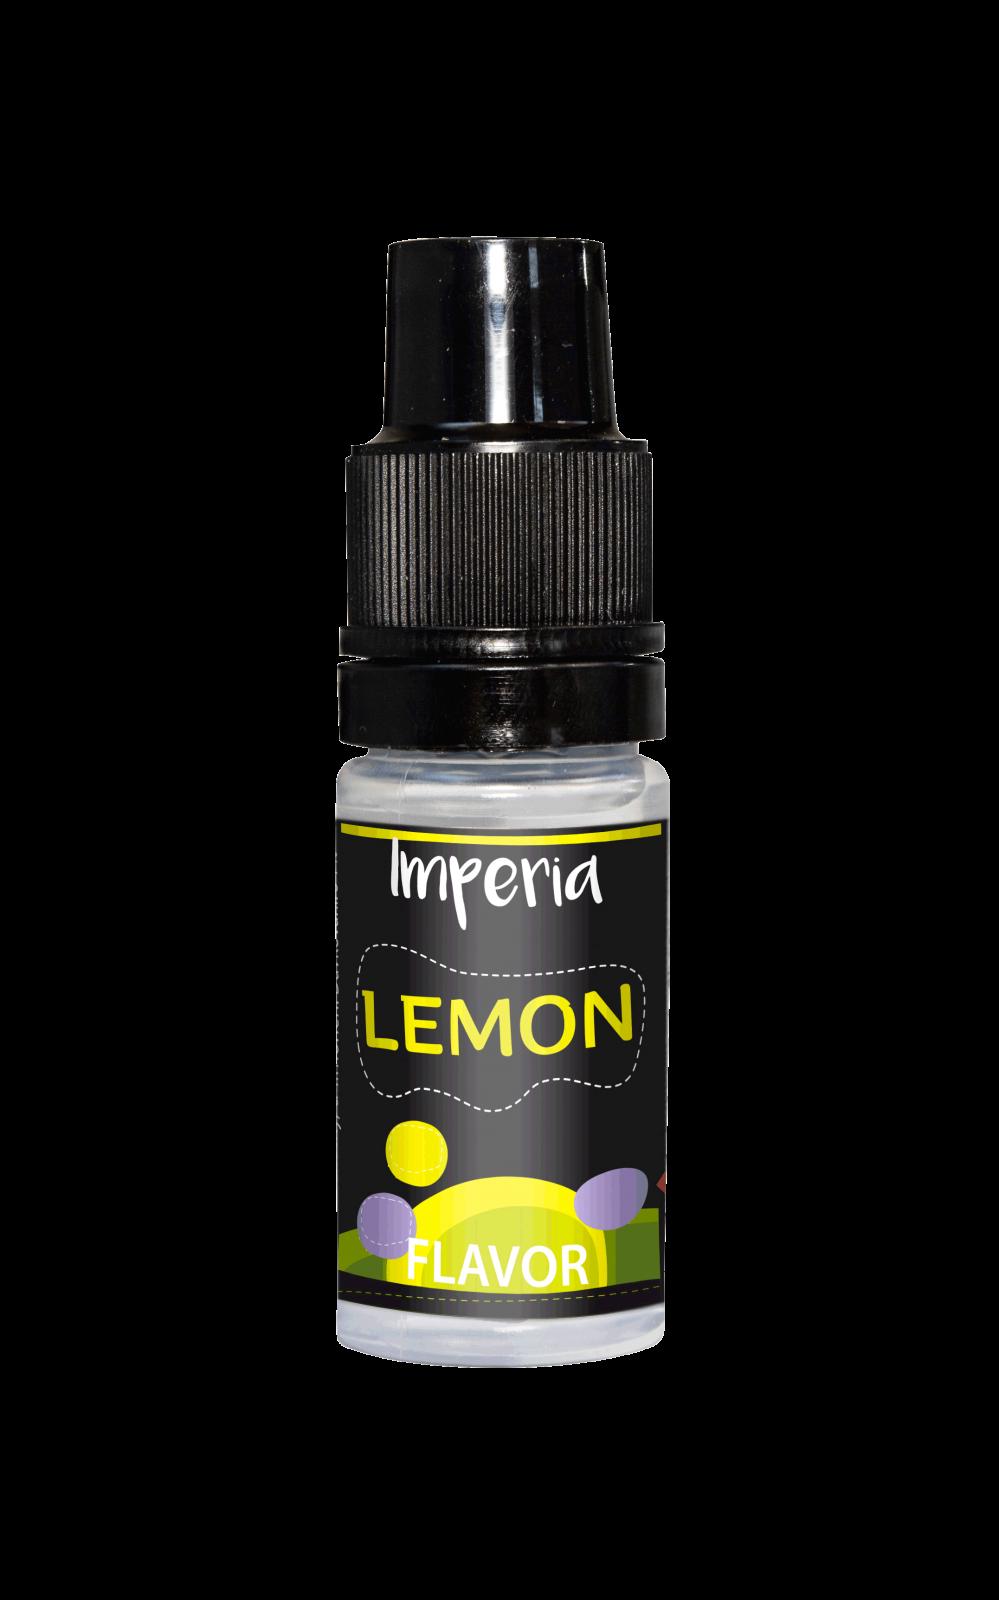 CITRÓN / Lemon - Aroma Imperia Black Label Boudoir Samadhi s.r.o.